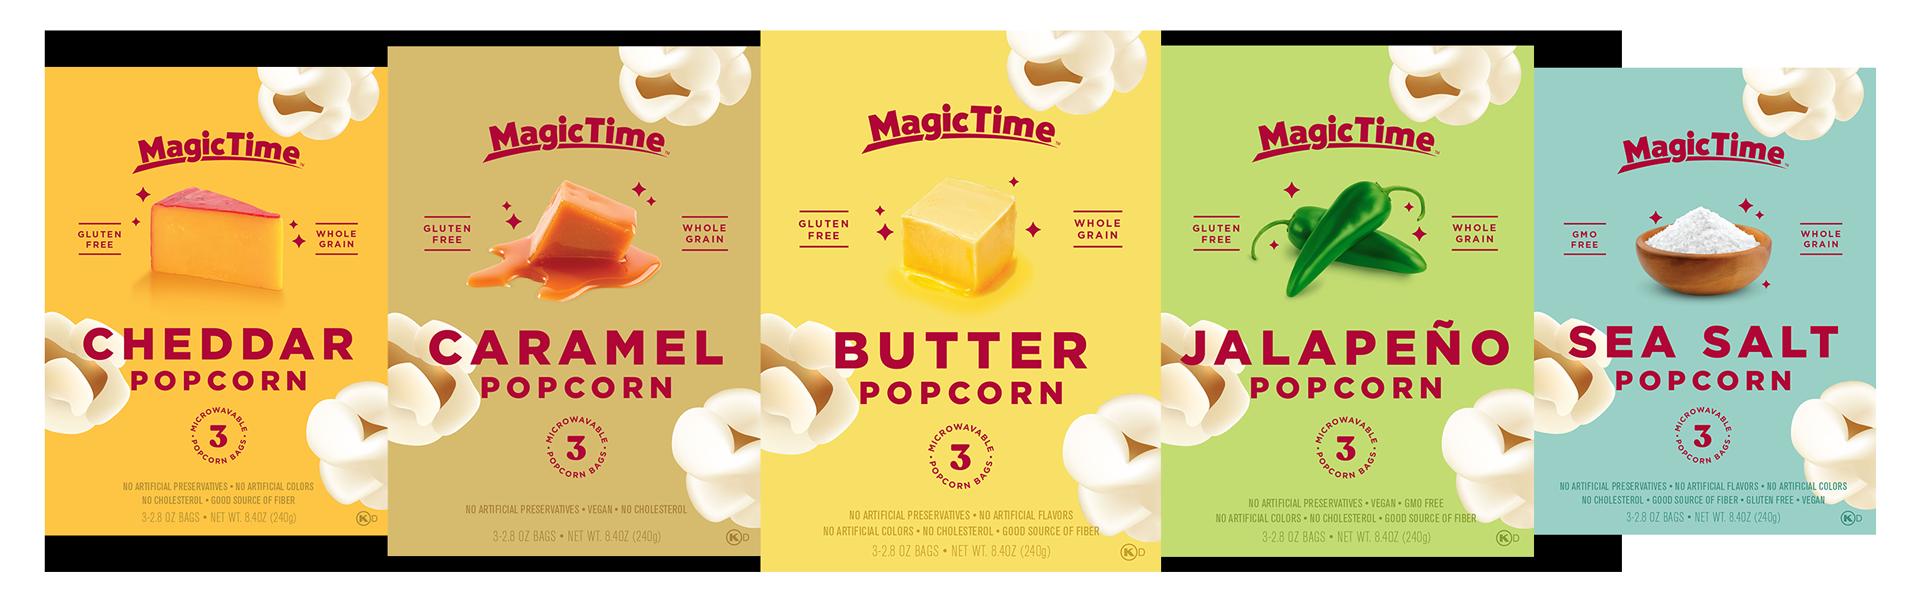 MagicTime Microwave Popcorn